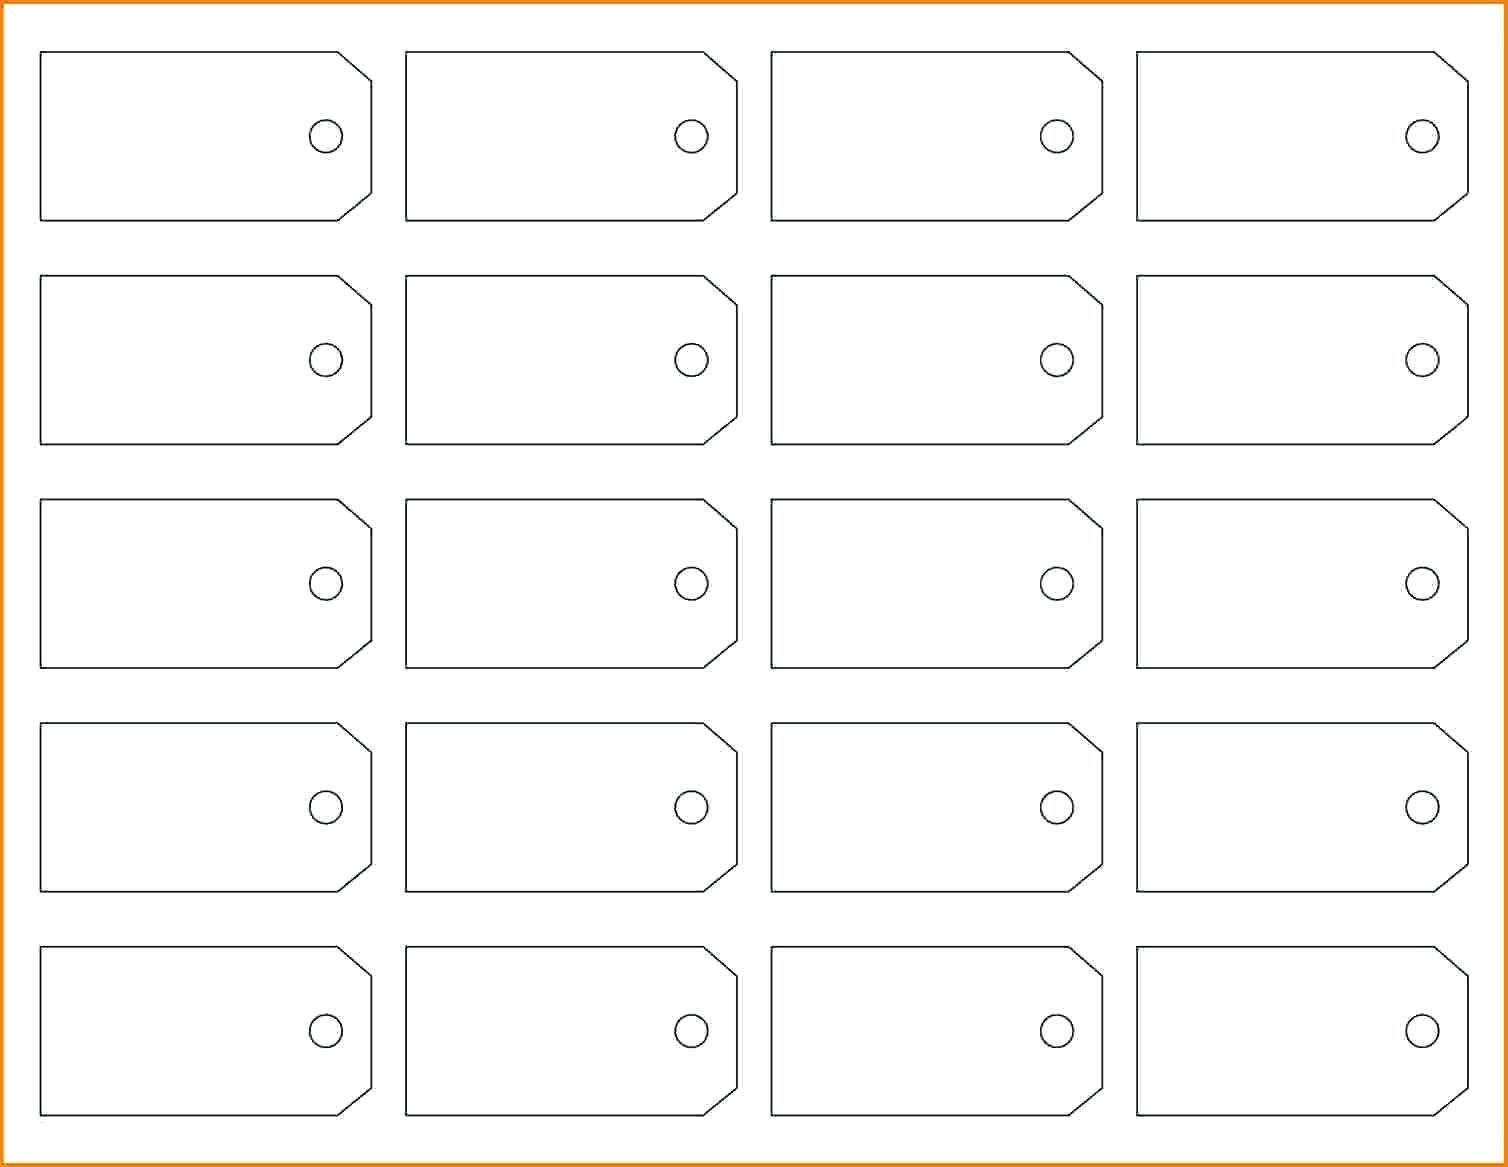 Price Tag Labels Template Incredible Printable Price Tags - Free Printable Price Labels